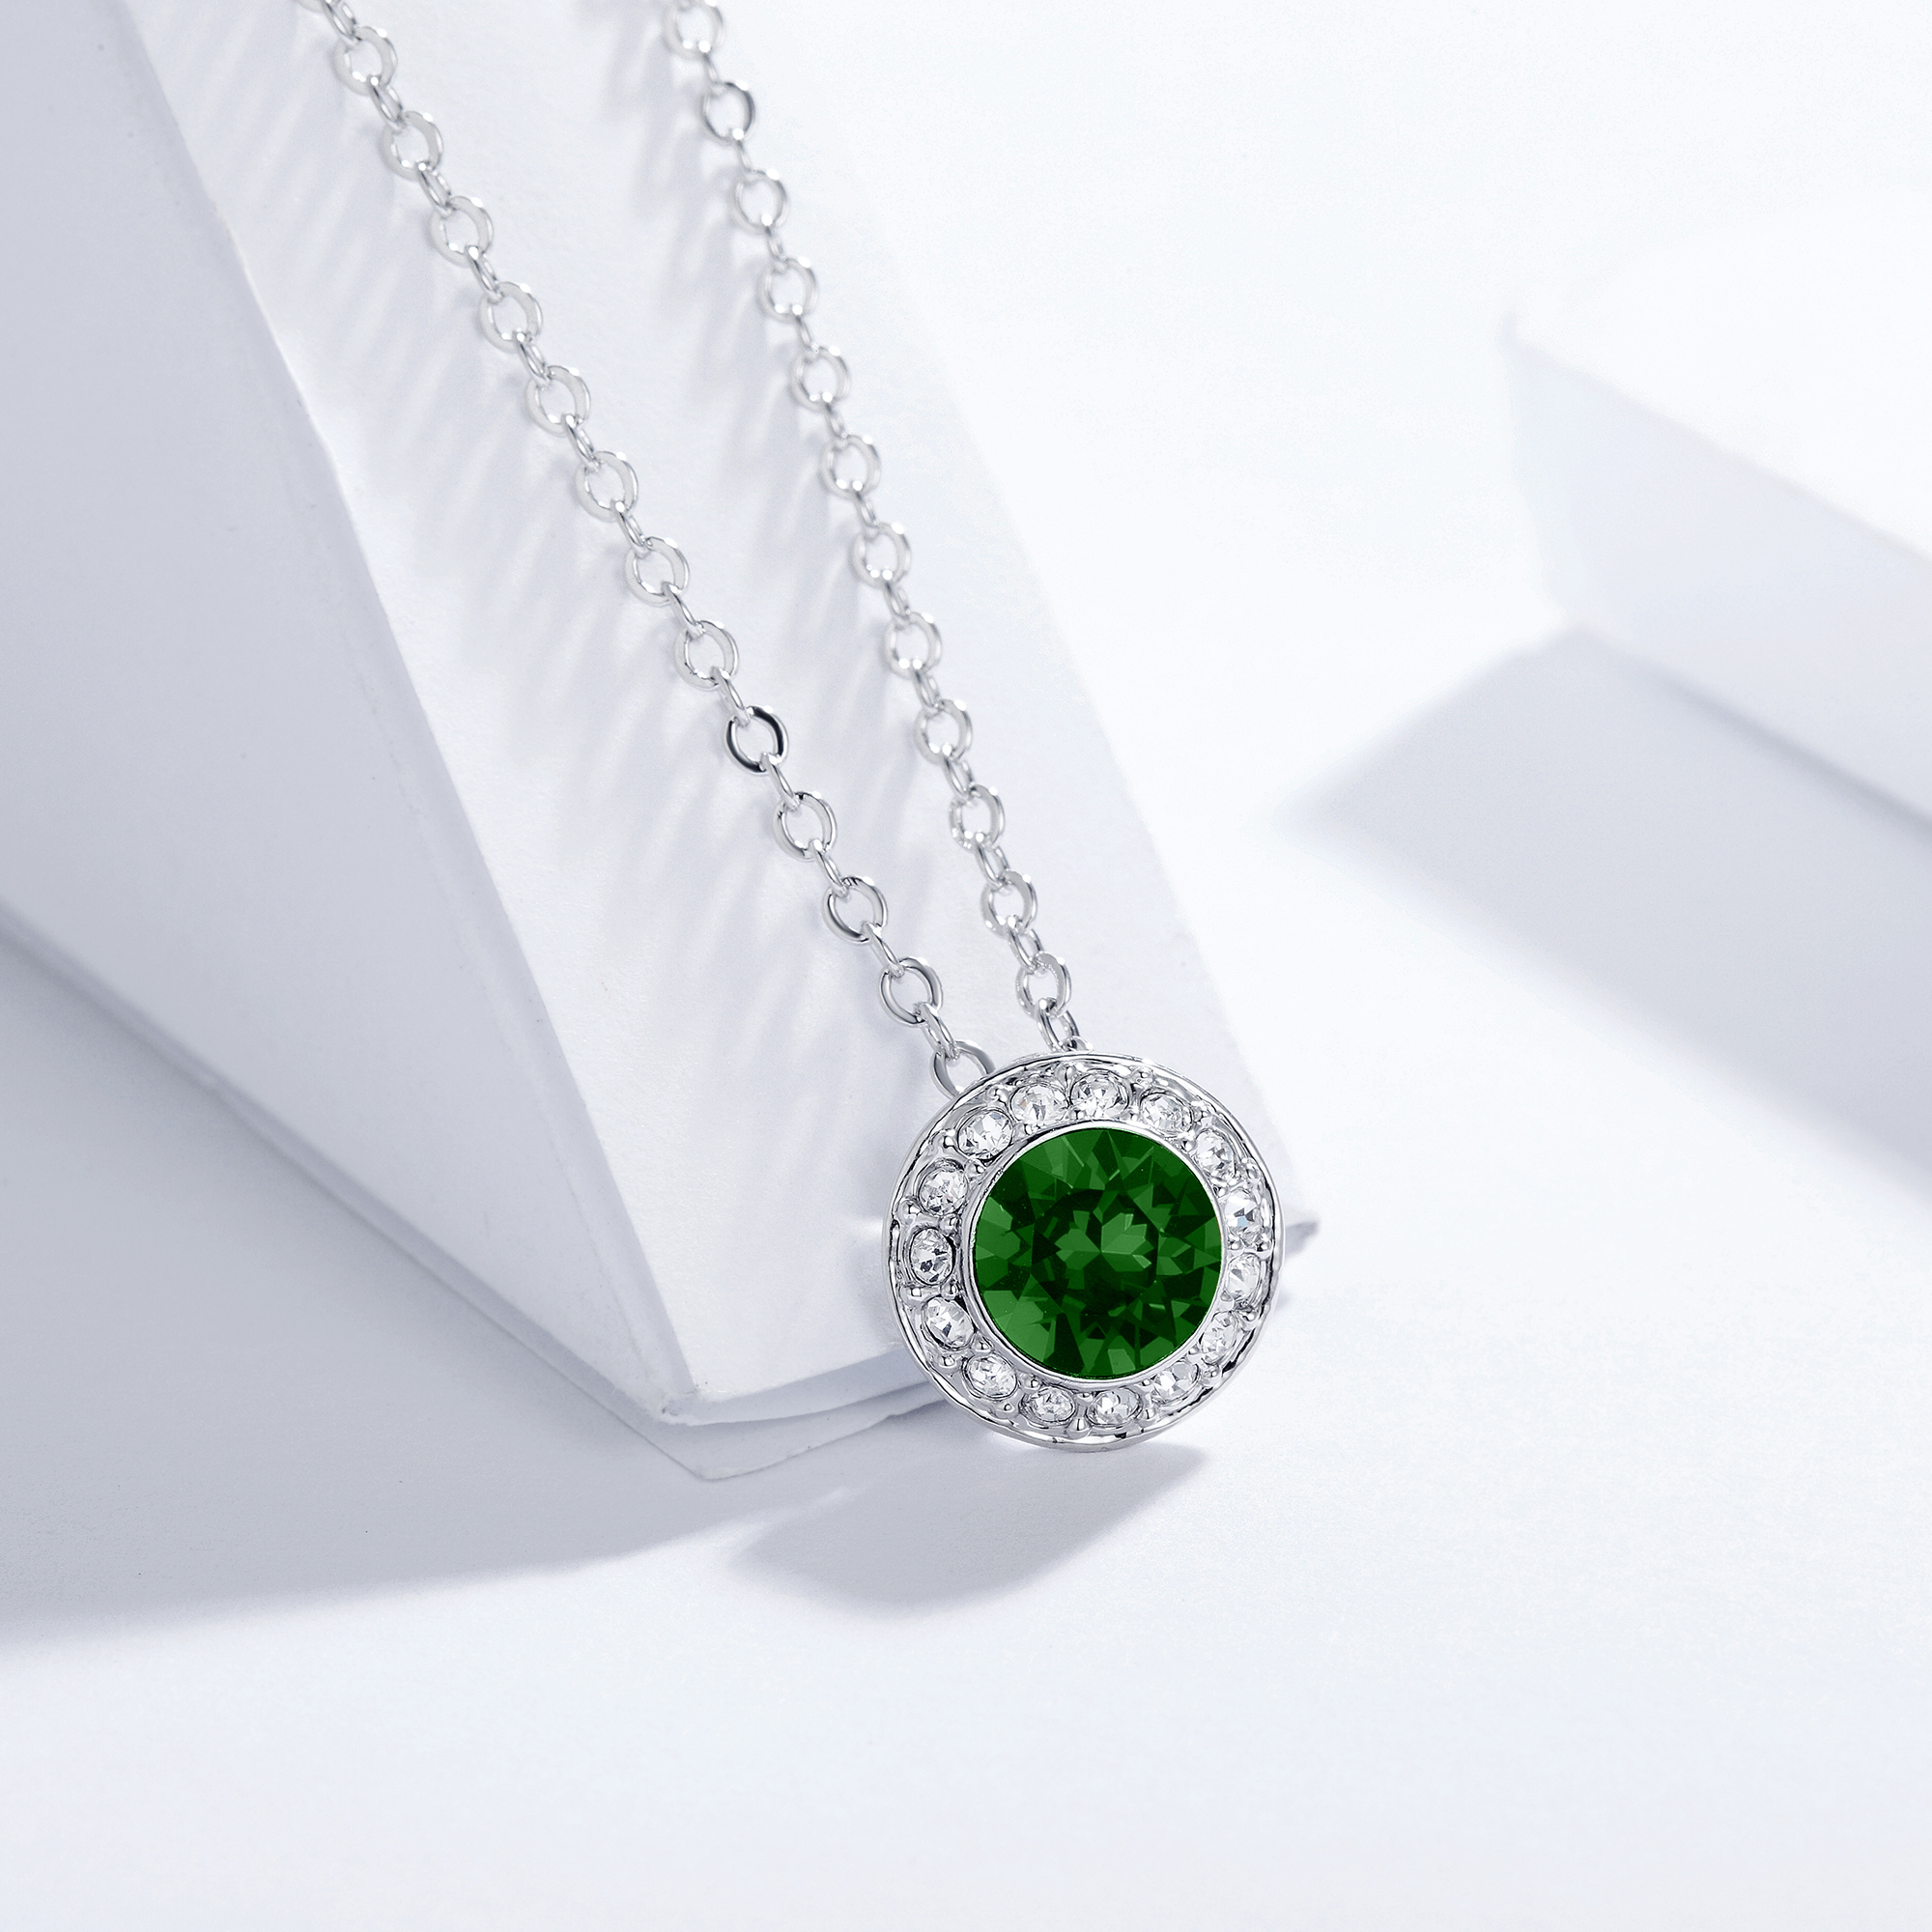 dca24507f Angelic Pendant Necklace with Emerald Swarovski Crystals Bridal Wedding  MYJS WGP